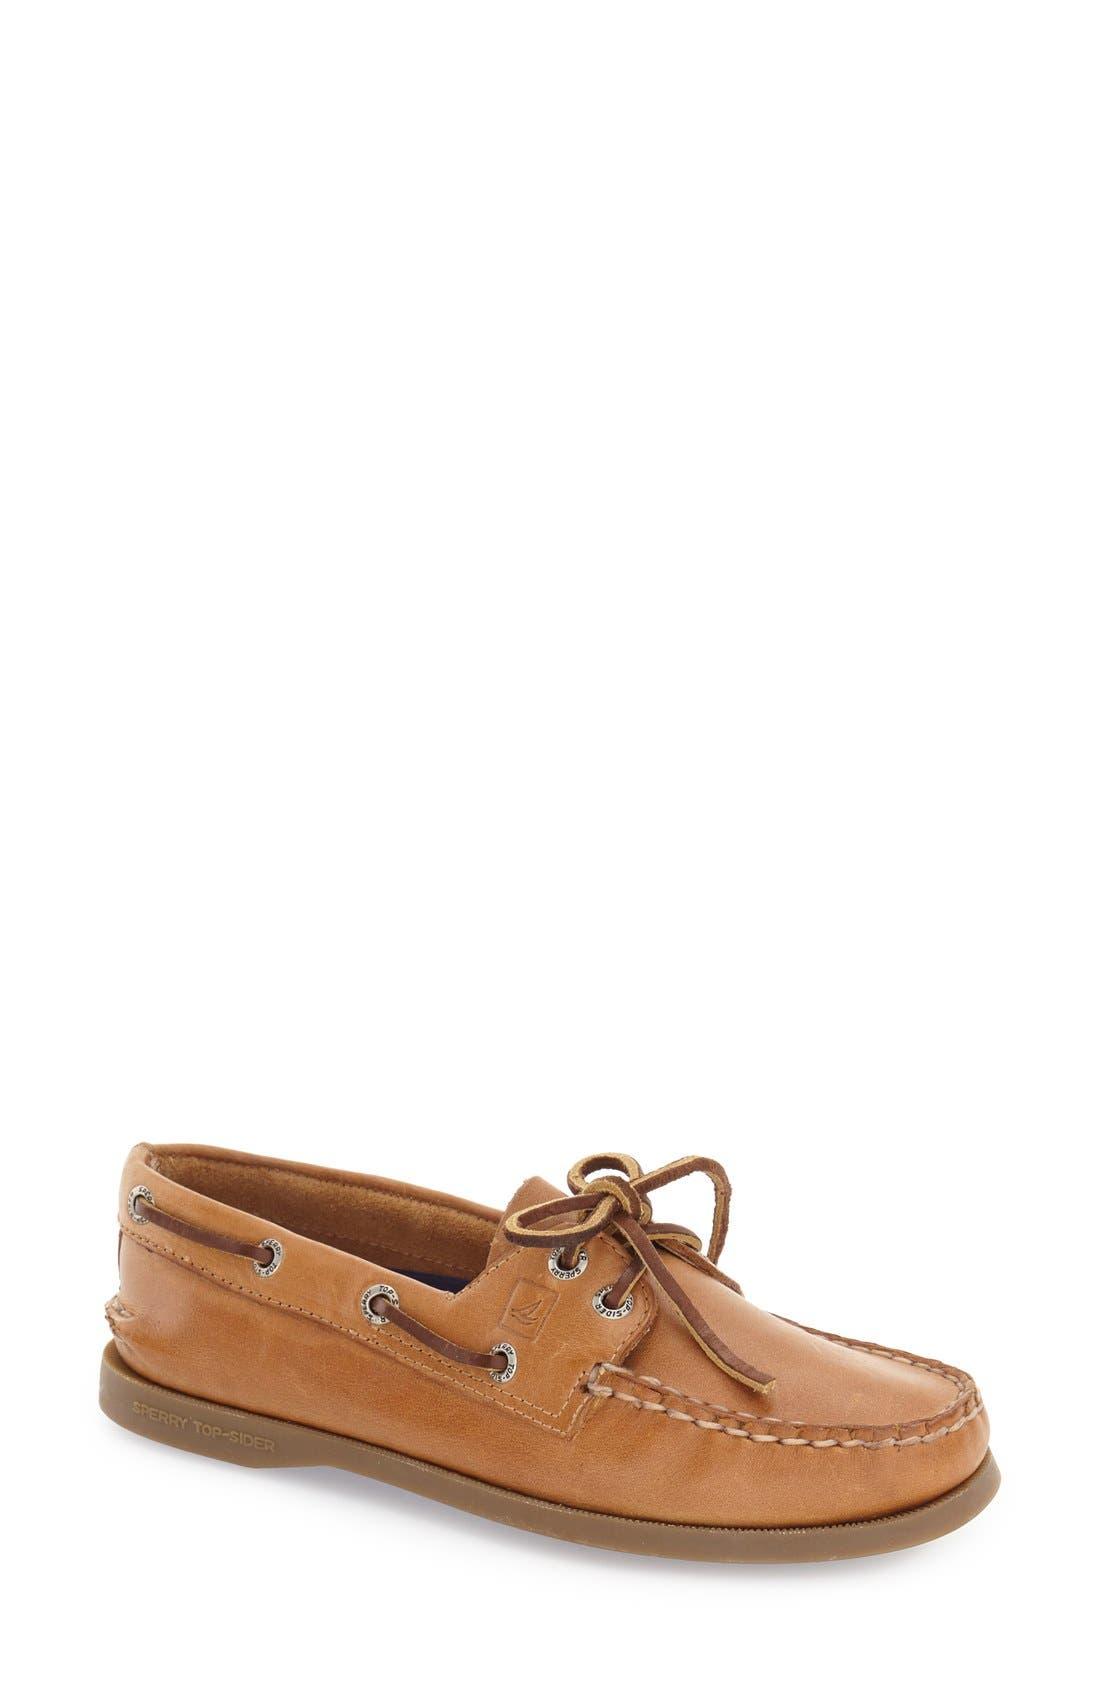 SPERRY 'Authentic Original' Boat Shoe, Main, color, NUTMEG/ SAHARA